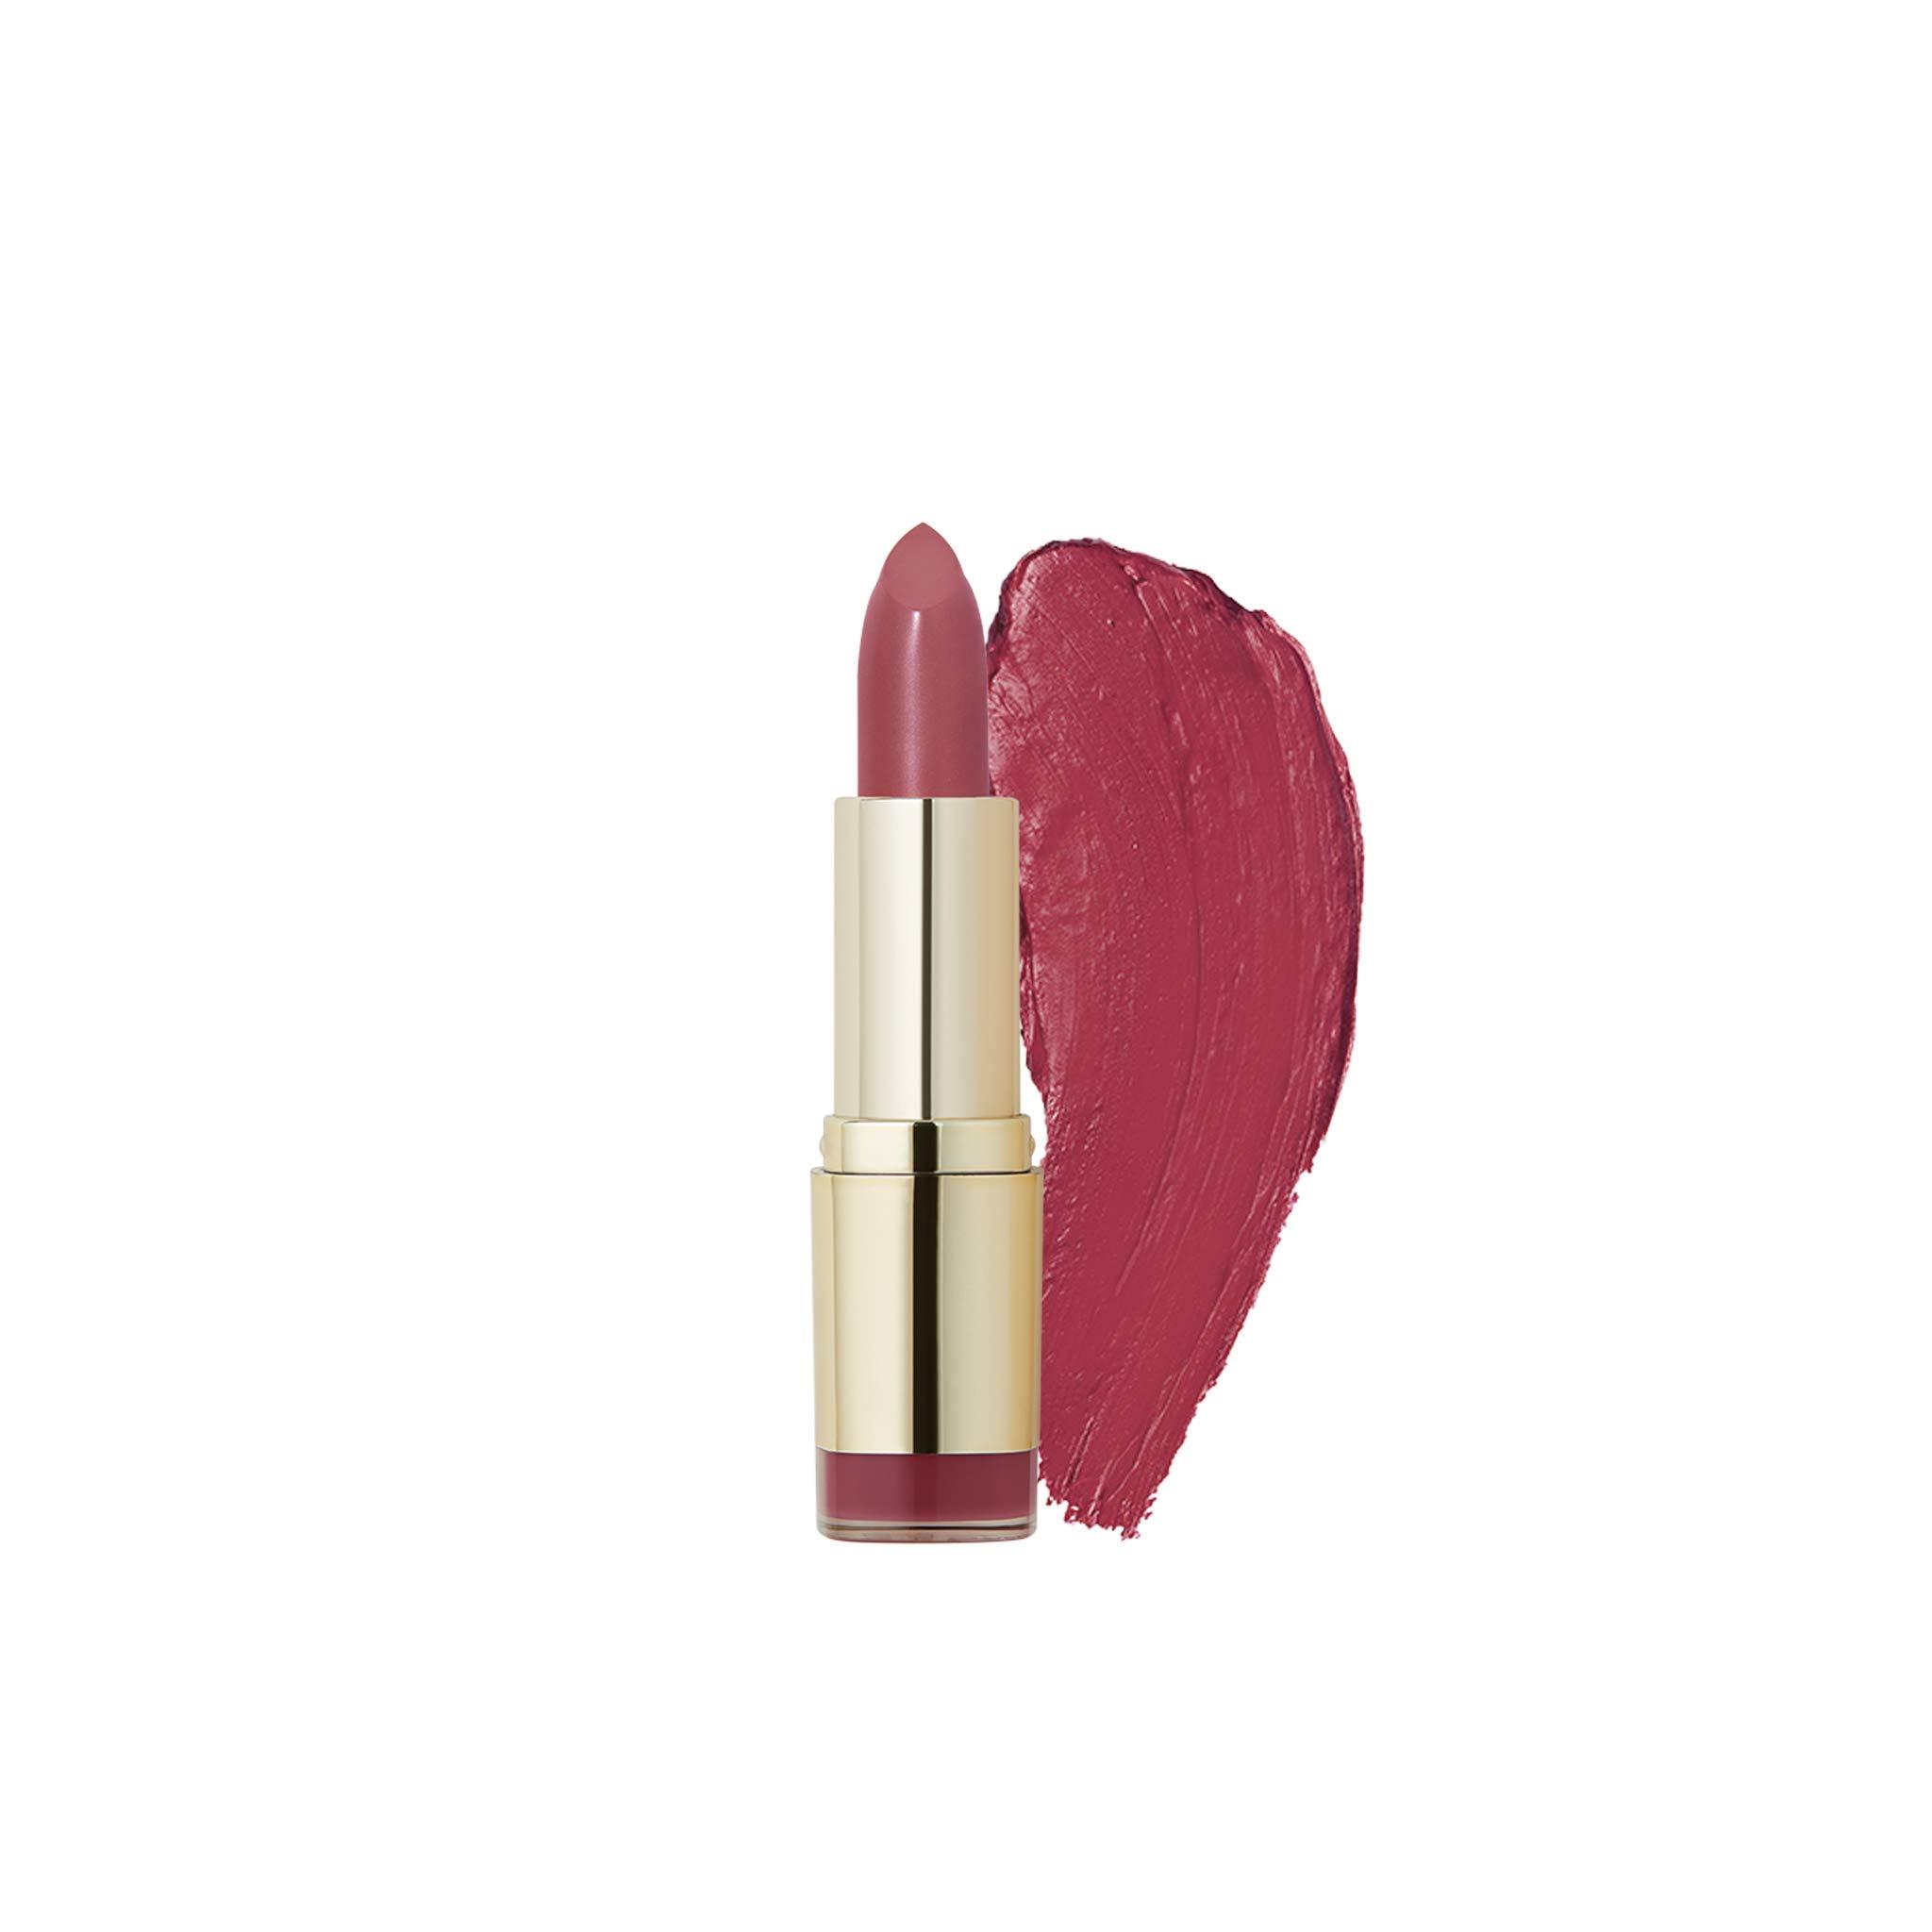 Milani Color Statement Lipstick - Plumrose, Cruelty-Free Nourishing Lip Stick in Vibrant Shades, Pink Lipstick, 0.14 Ounce